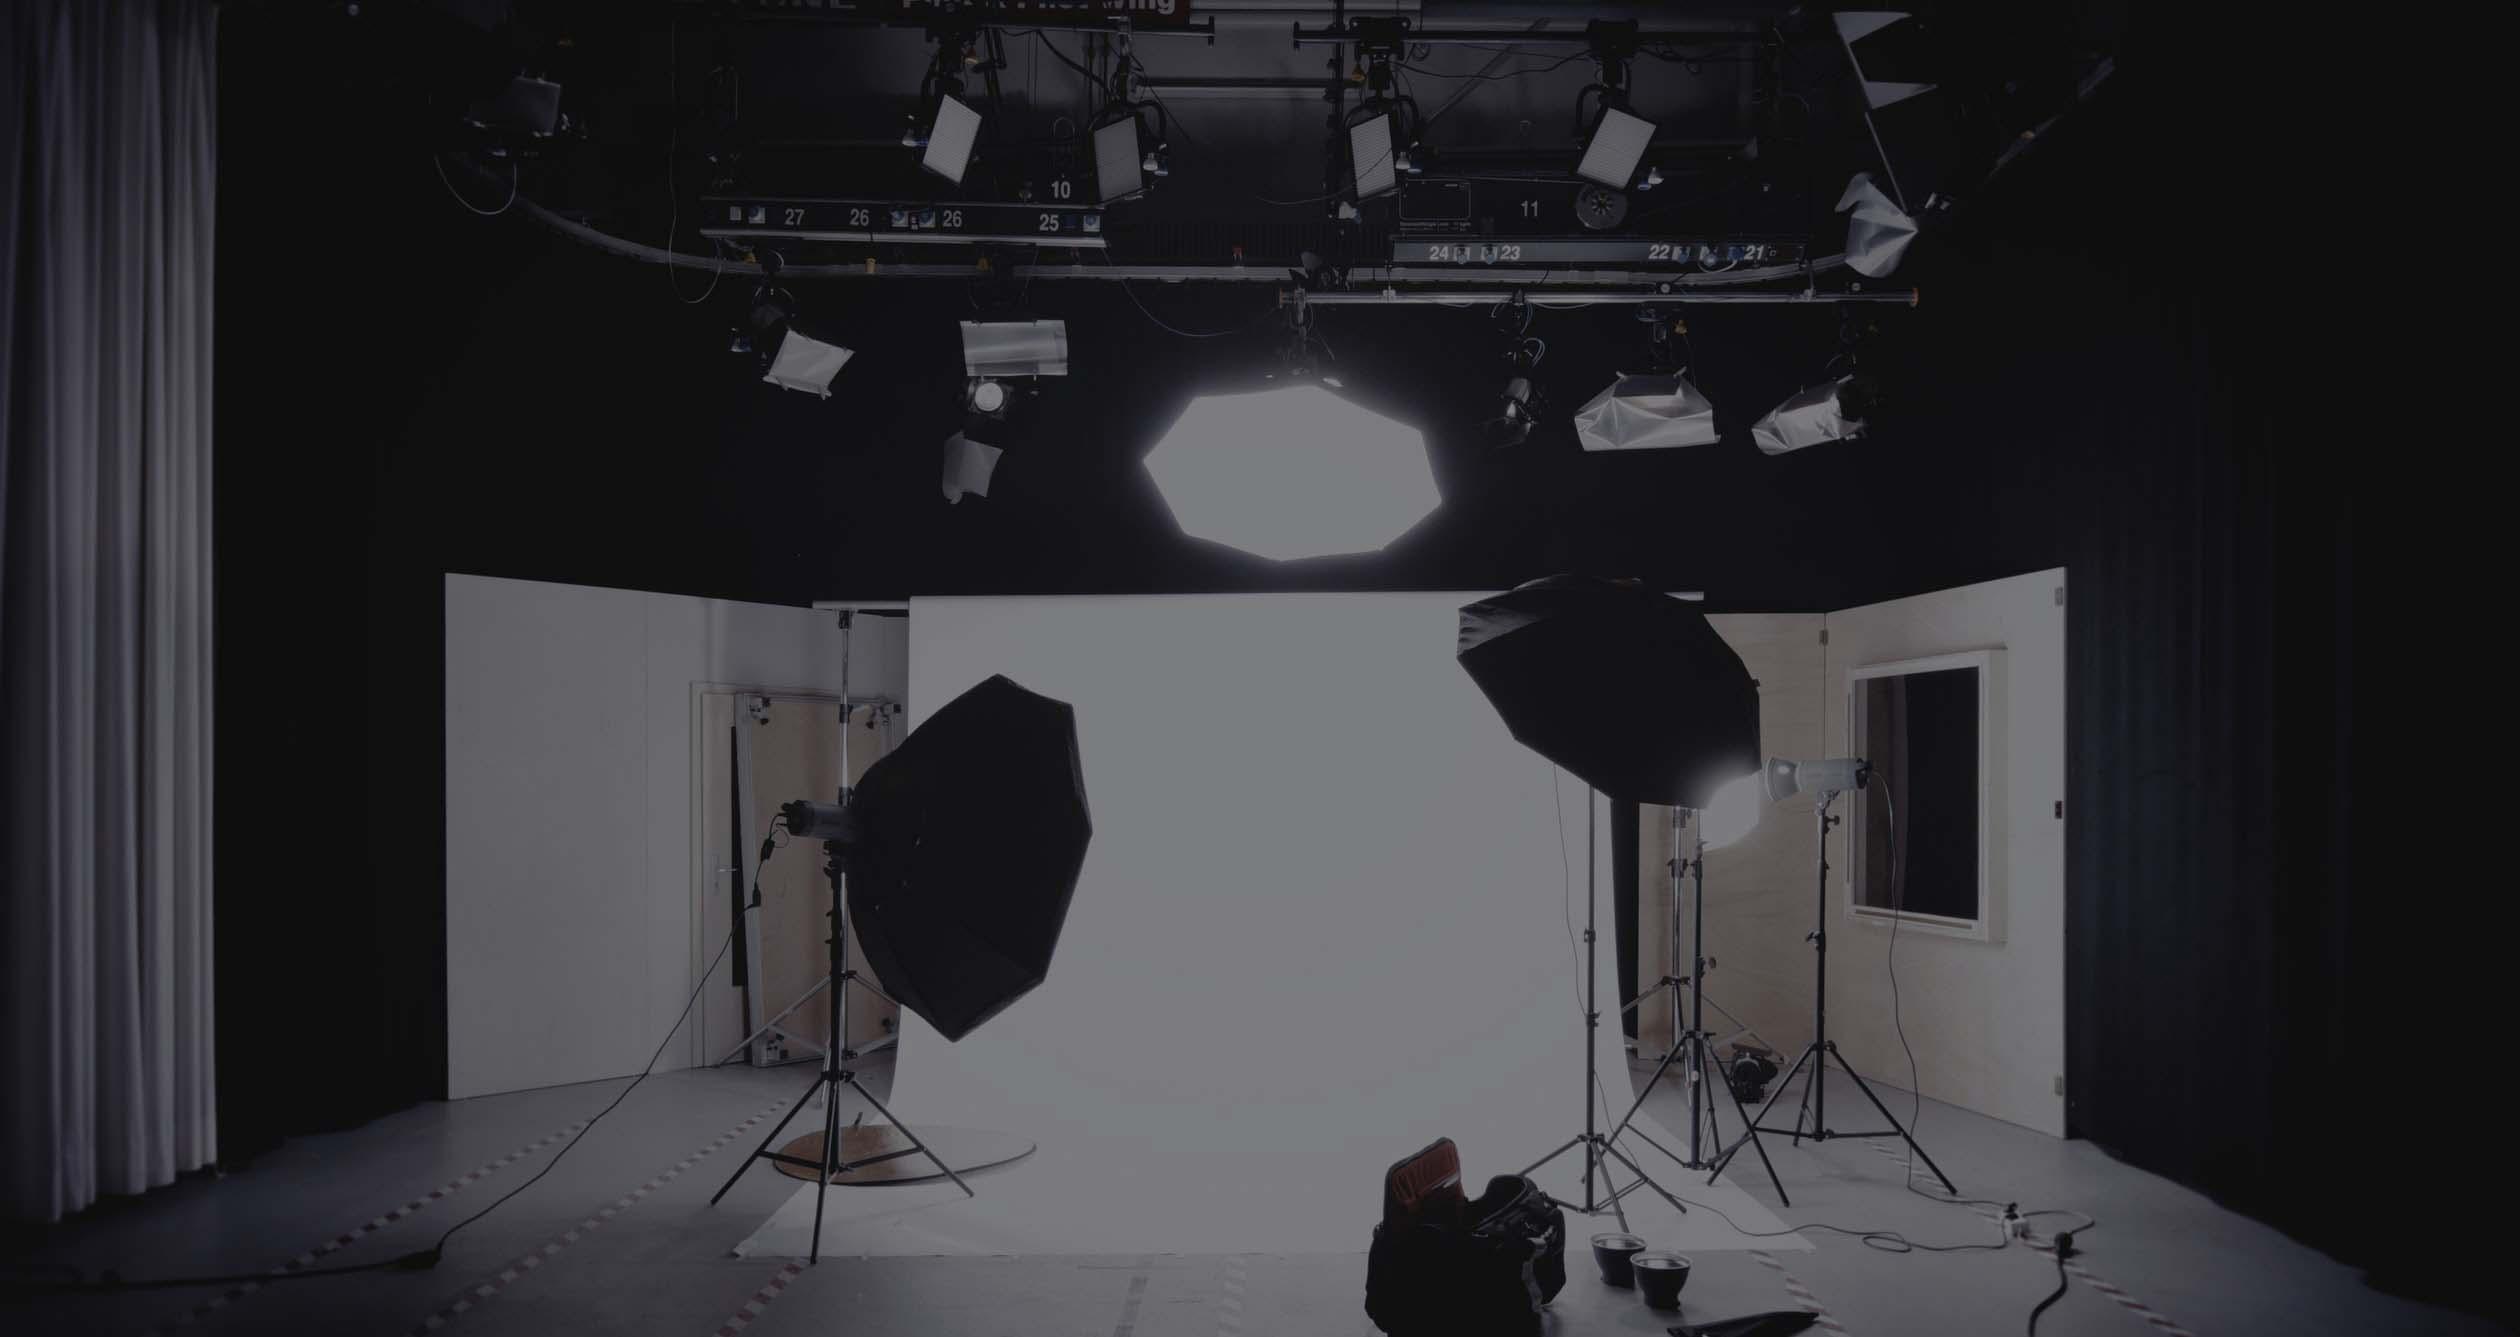 dwv photography